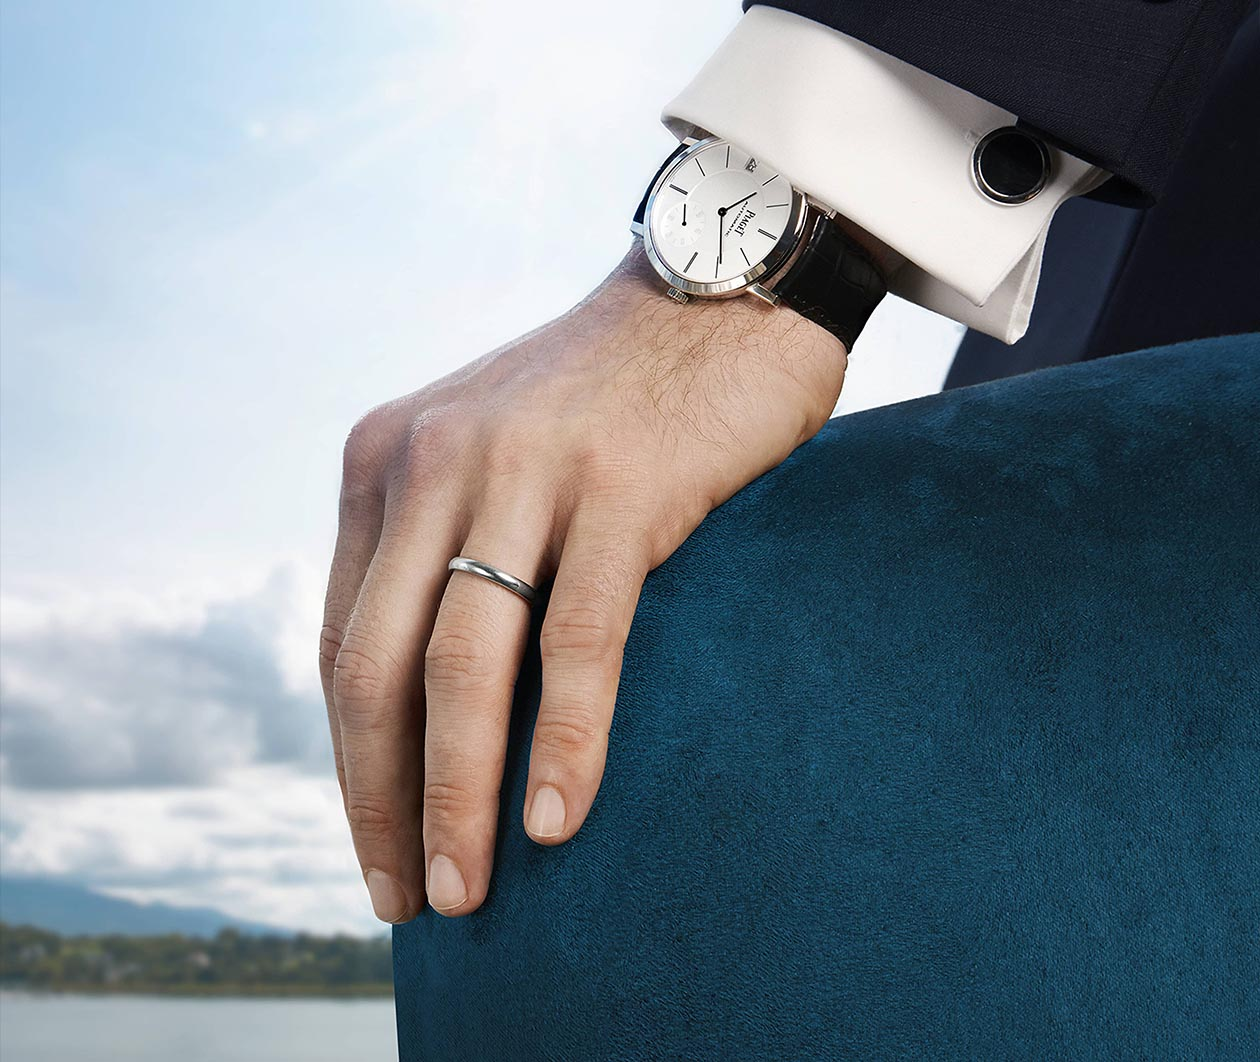 Piaget Altiplano watch G0A38130 Carousel 5 FINAL